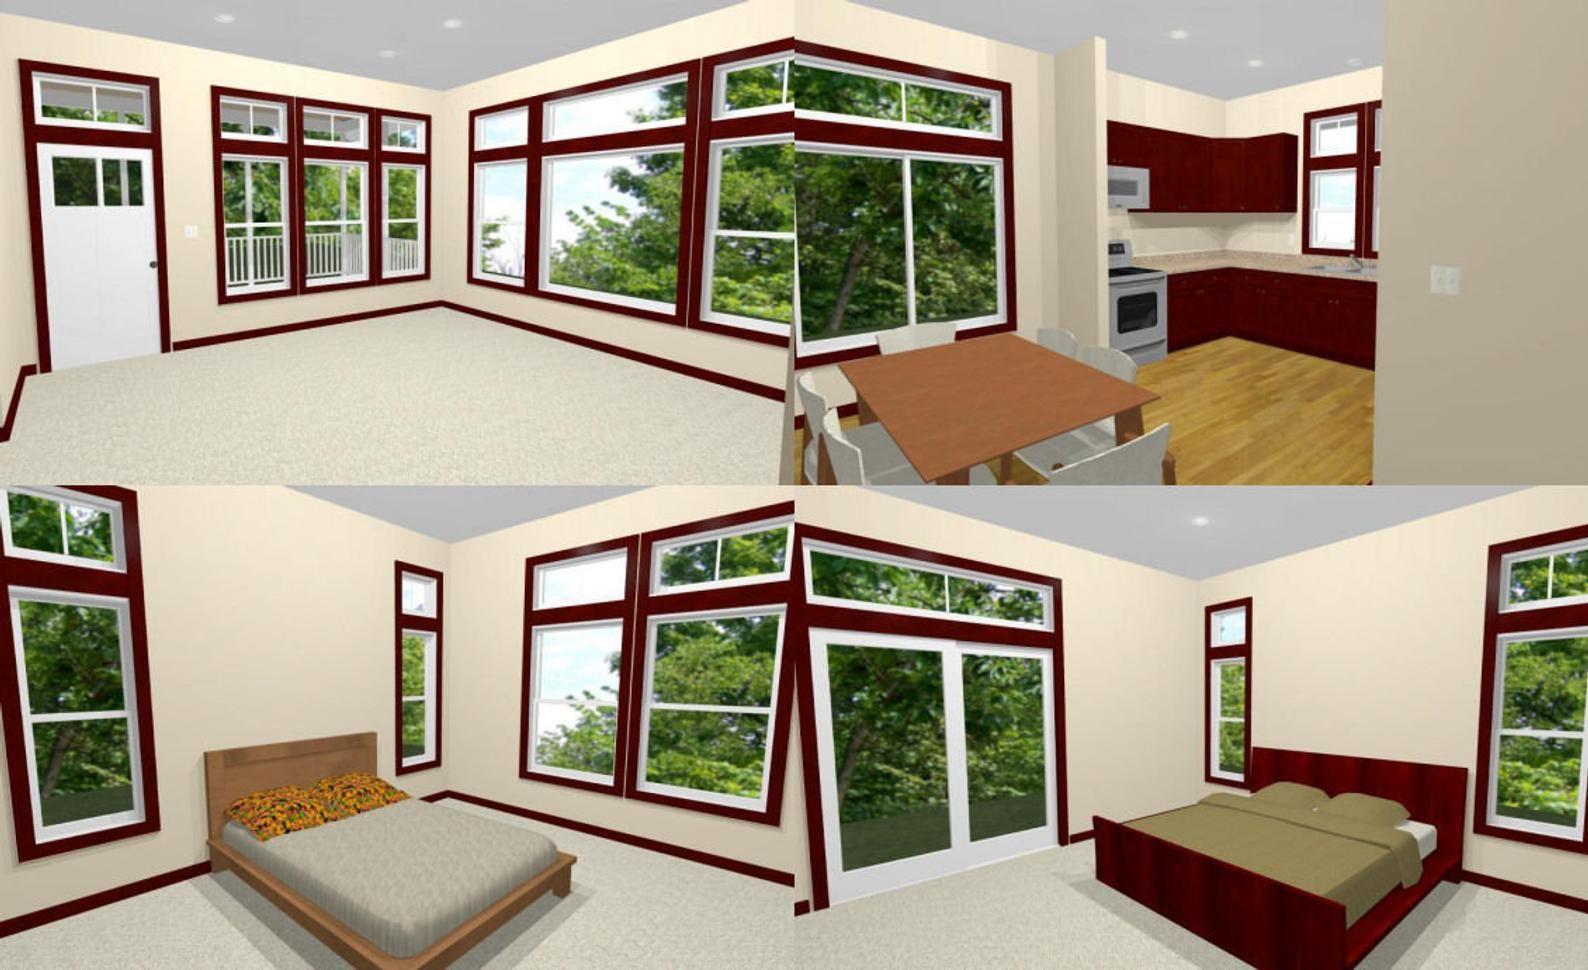 30x40 House 2Bedroom 2Bath 1,136 sq ft PDF